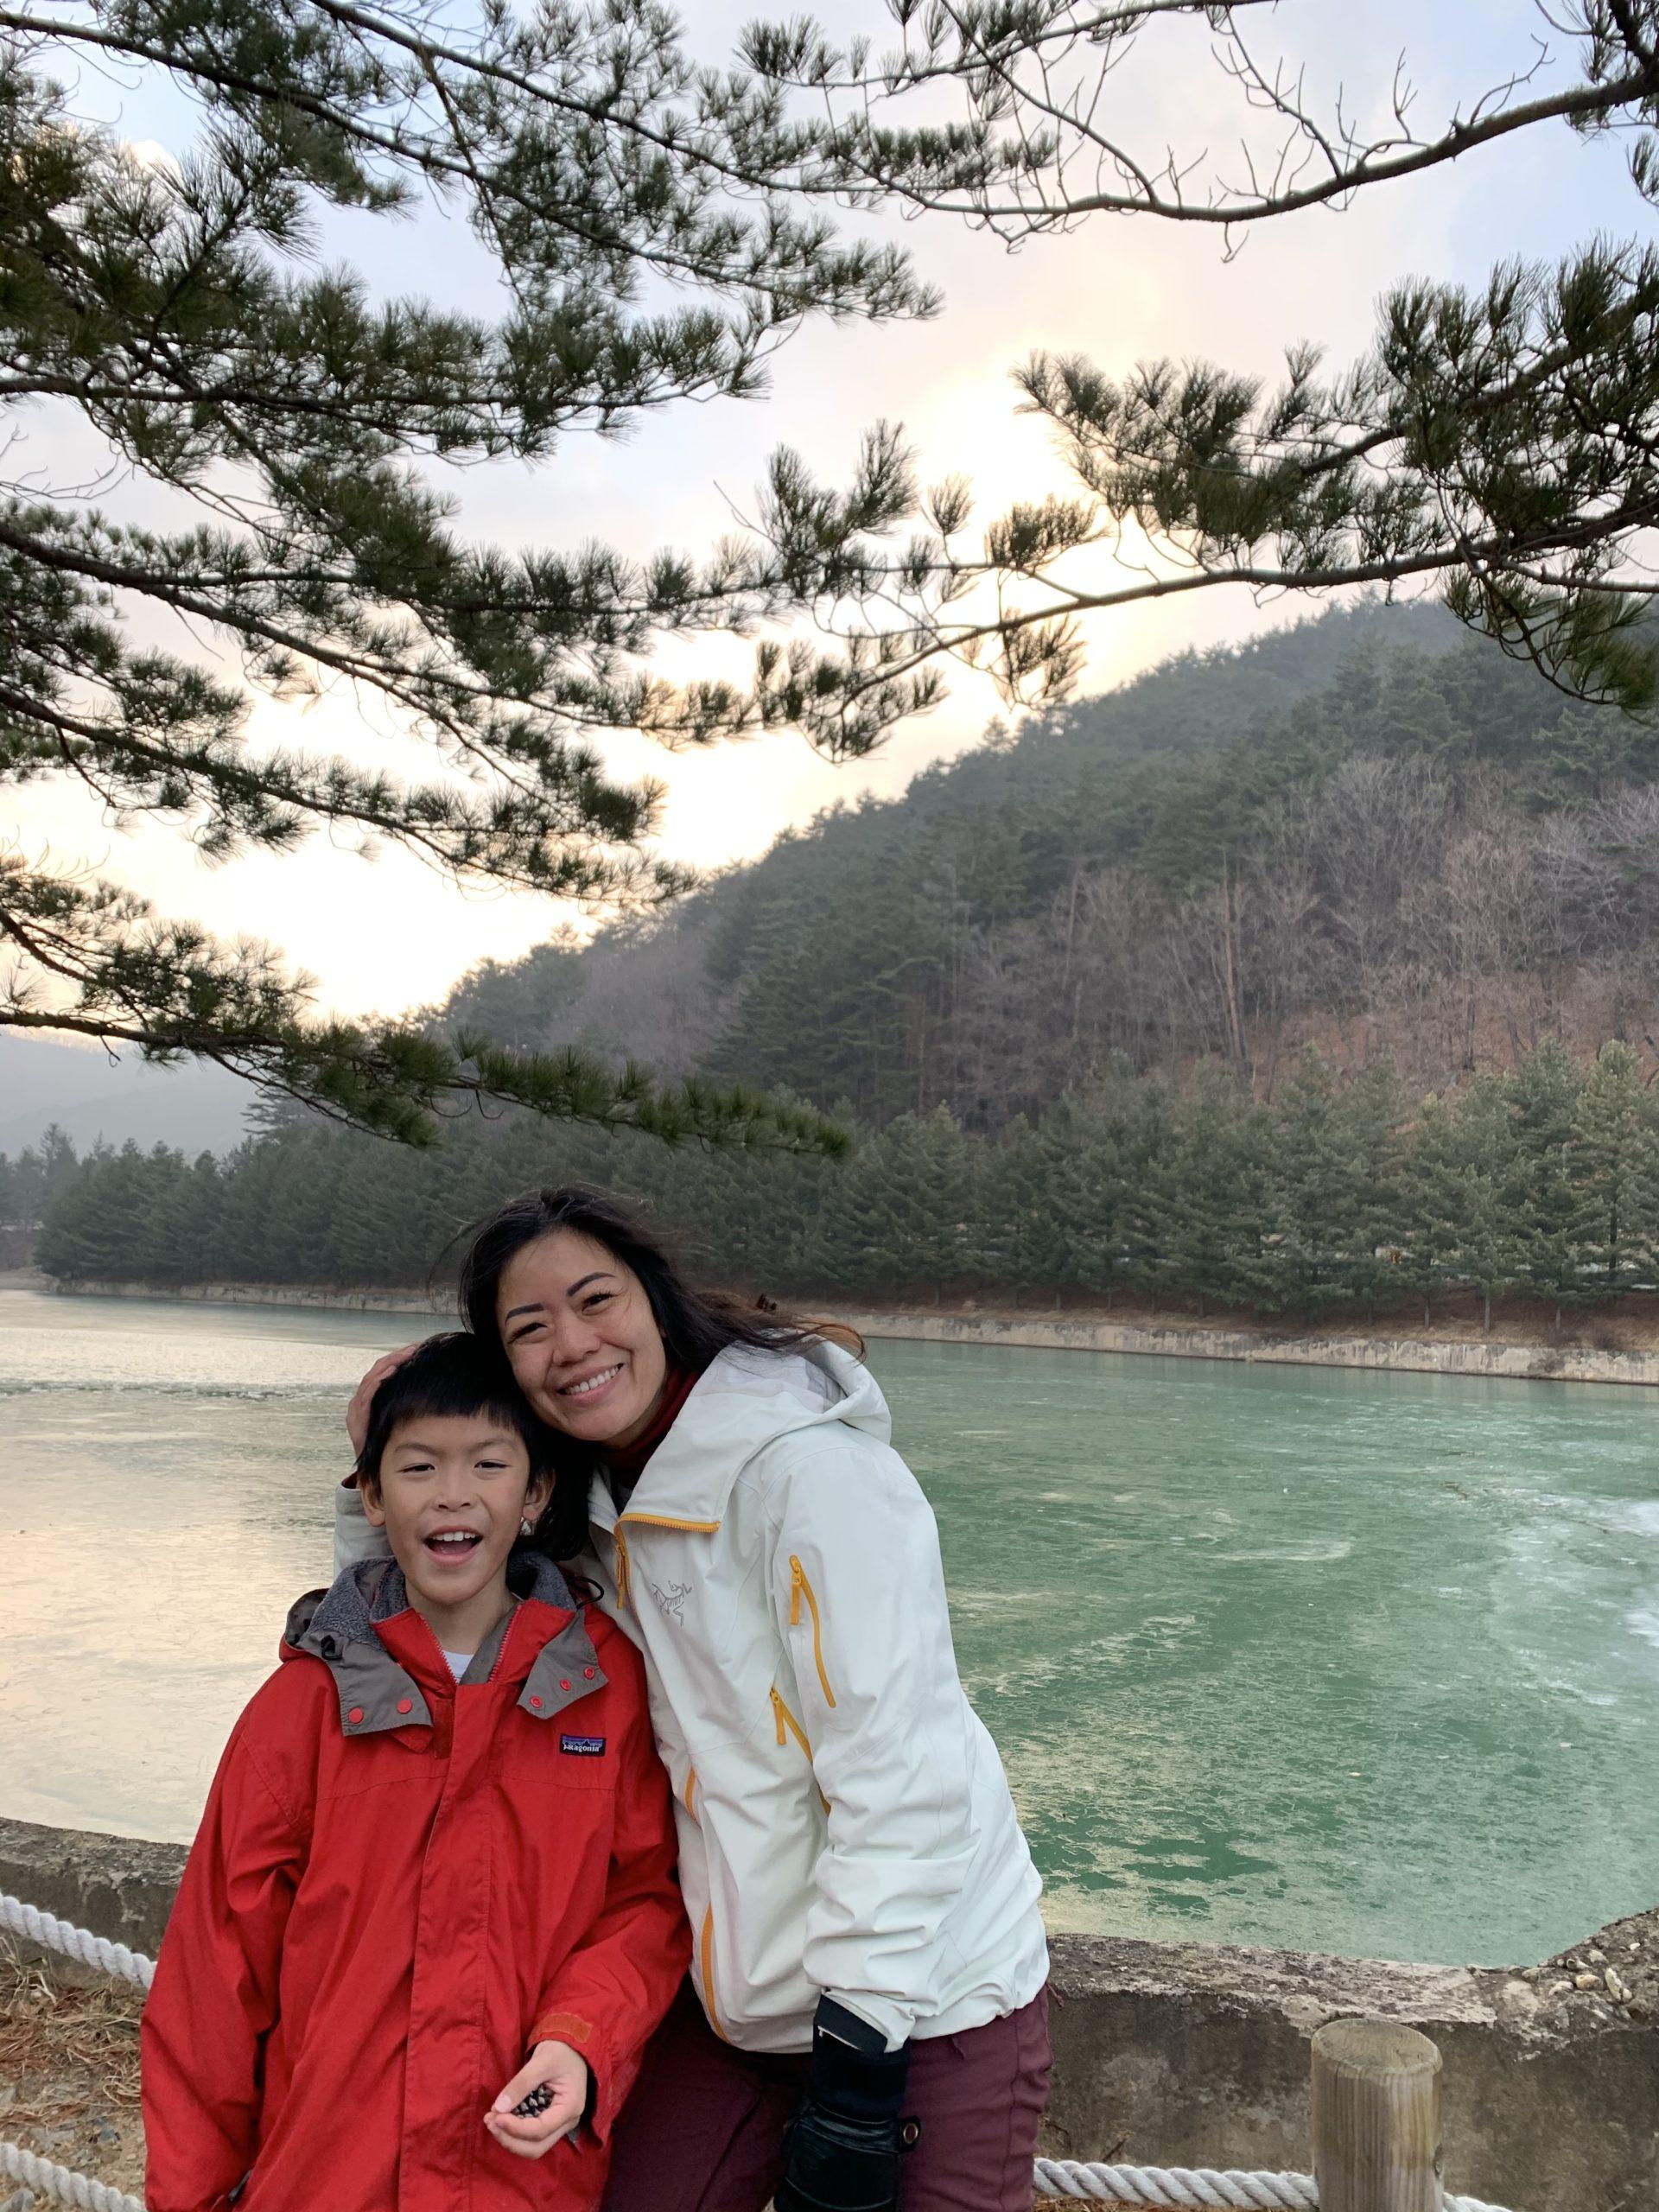 Frozen lake in PyeongChang